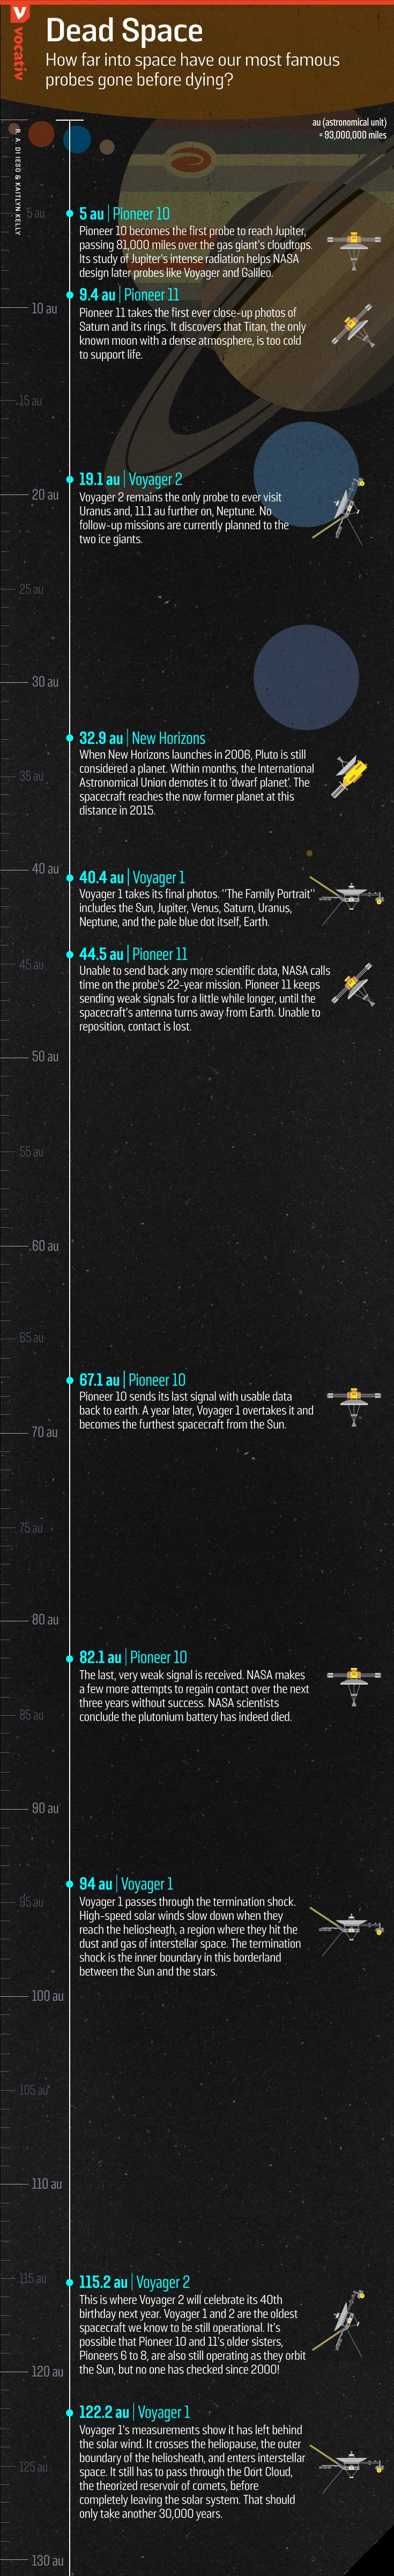 2016_10_20 probes distance from sun KK version3